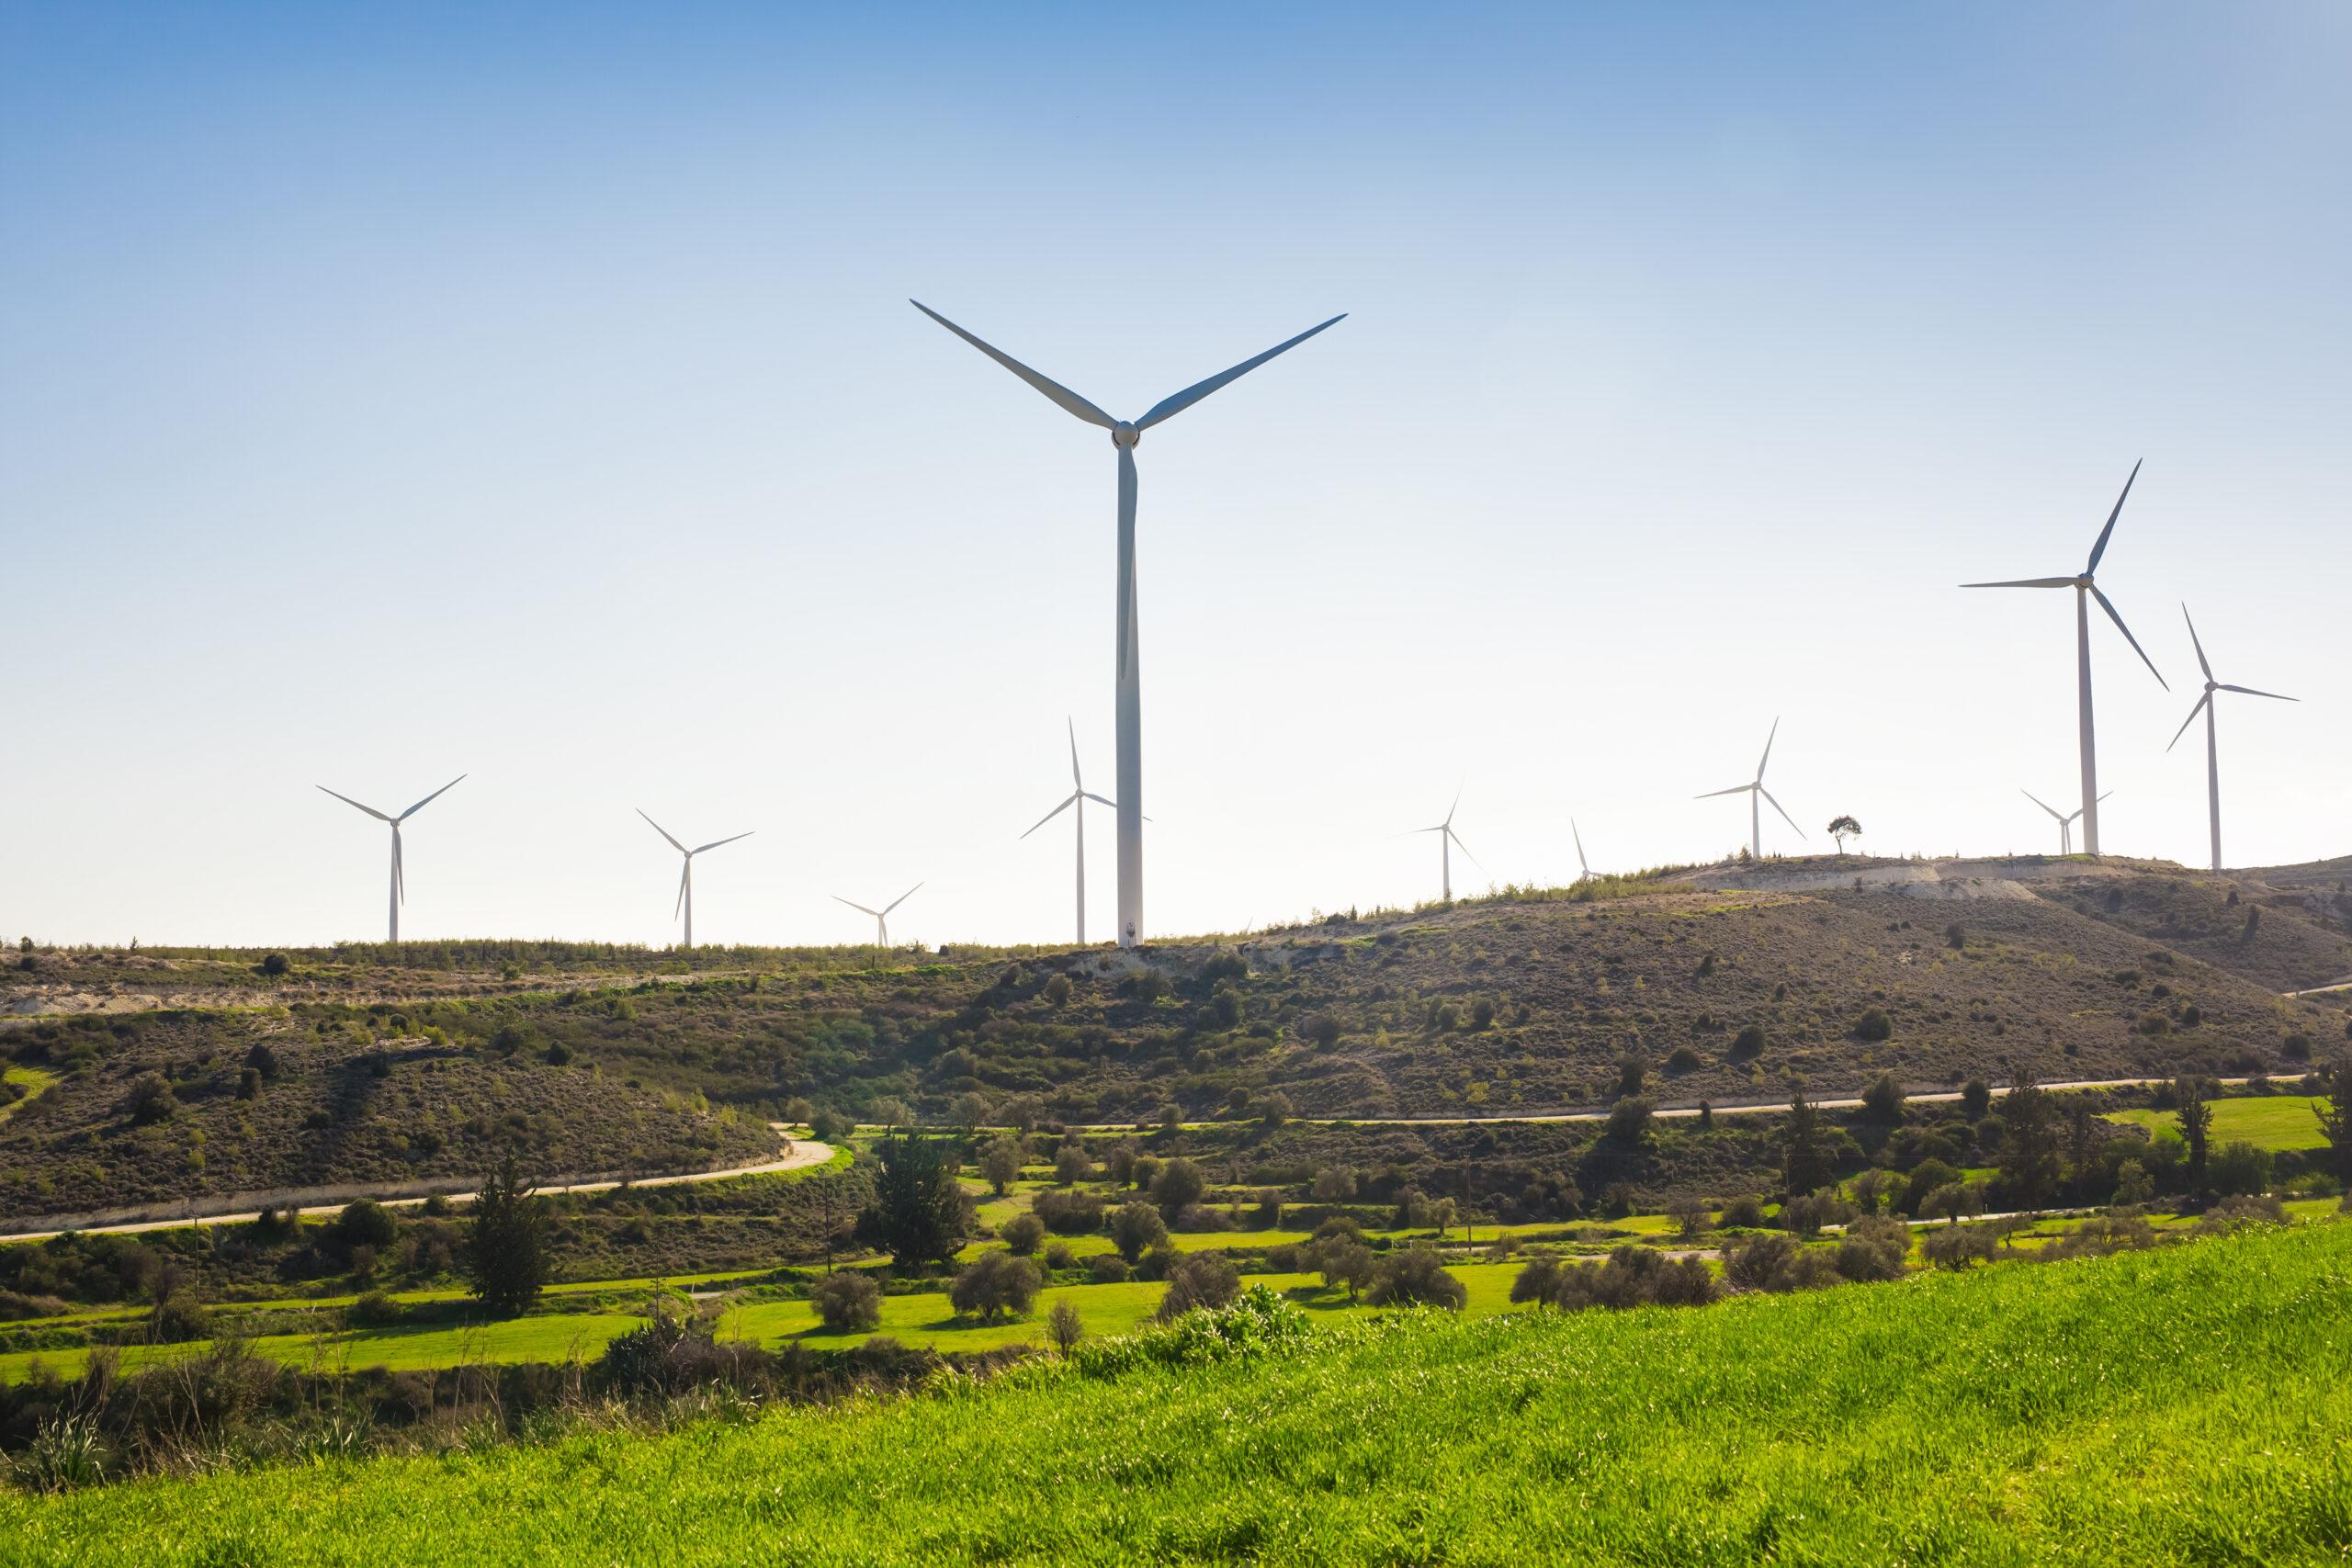 wind-mills-during-bright-summer-day-PBWYK4V